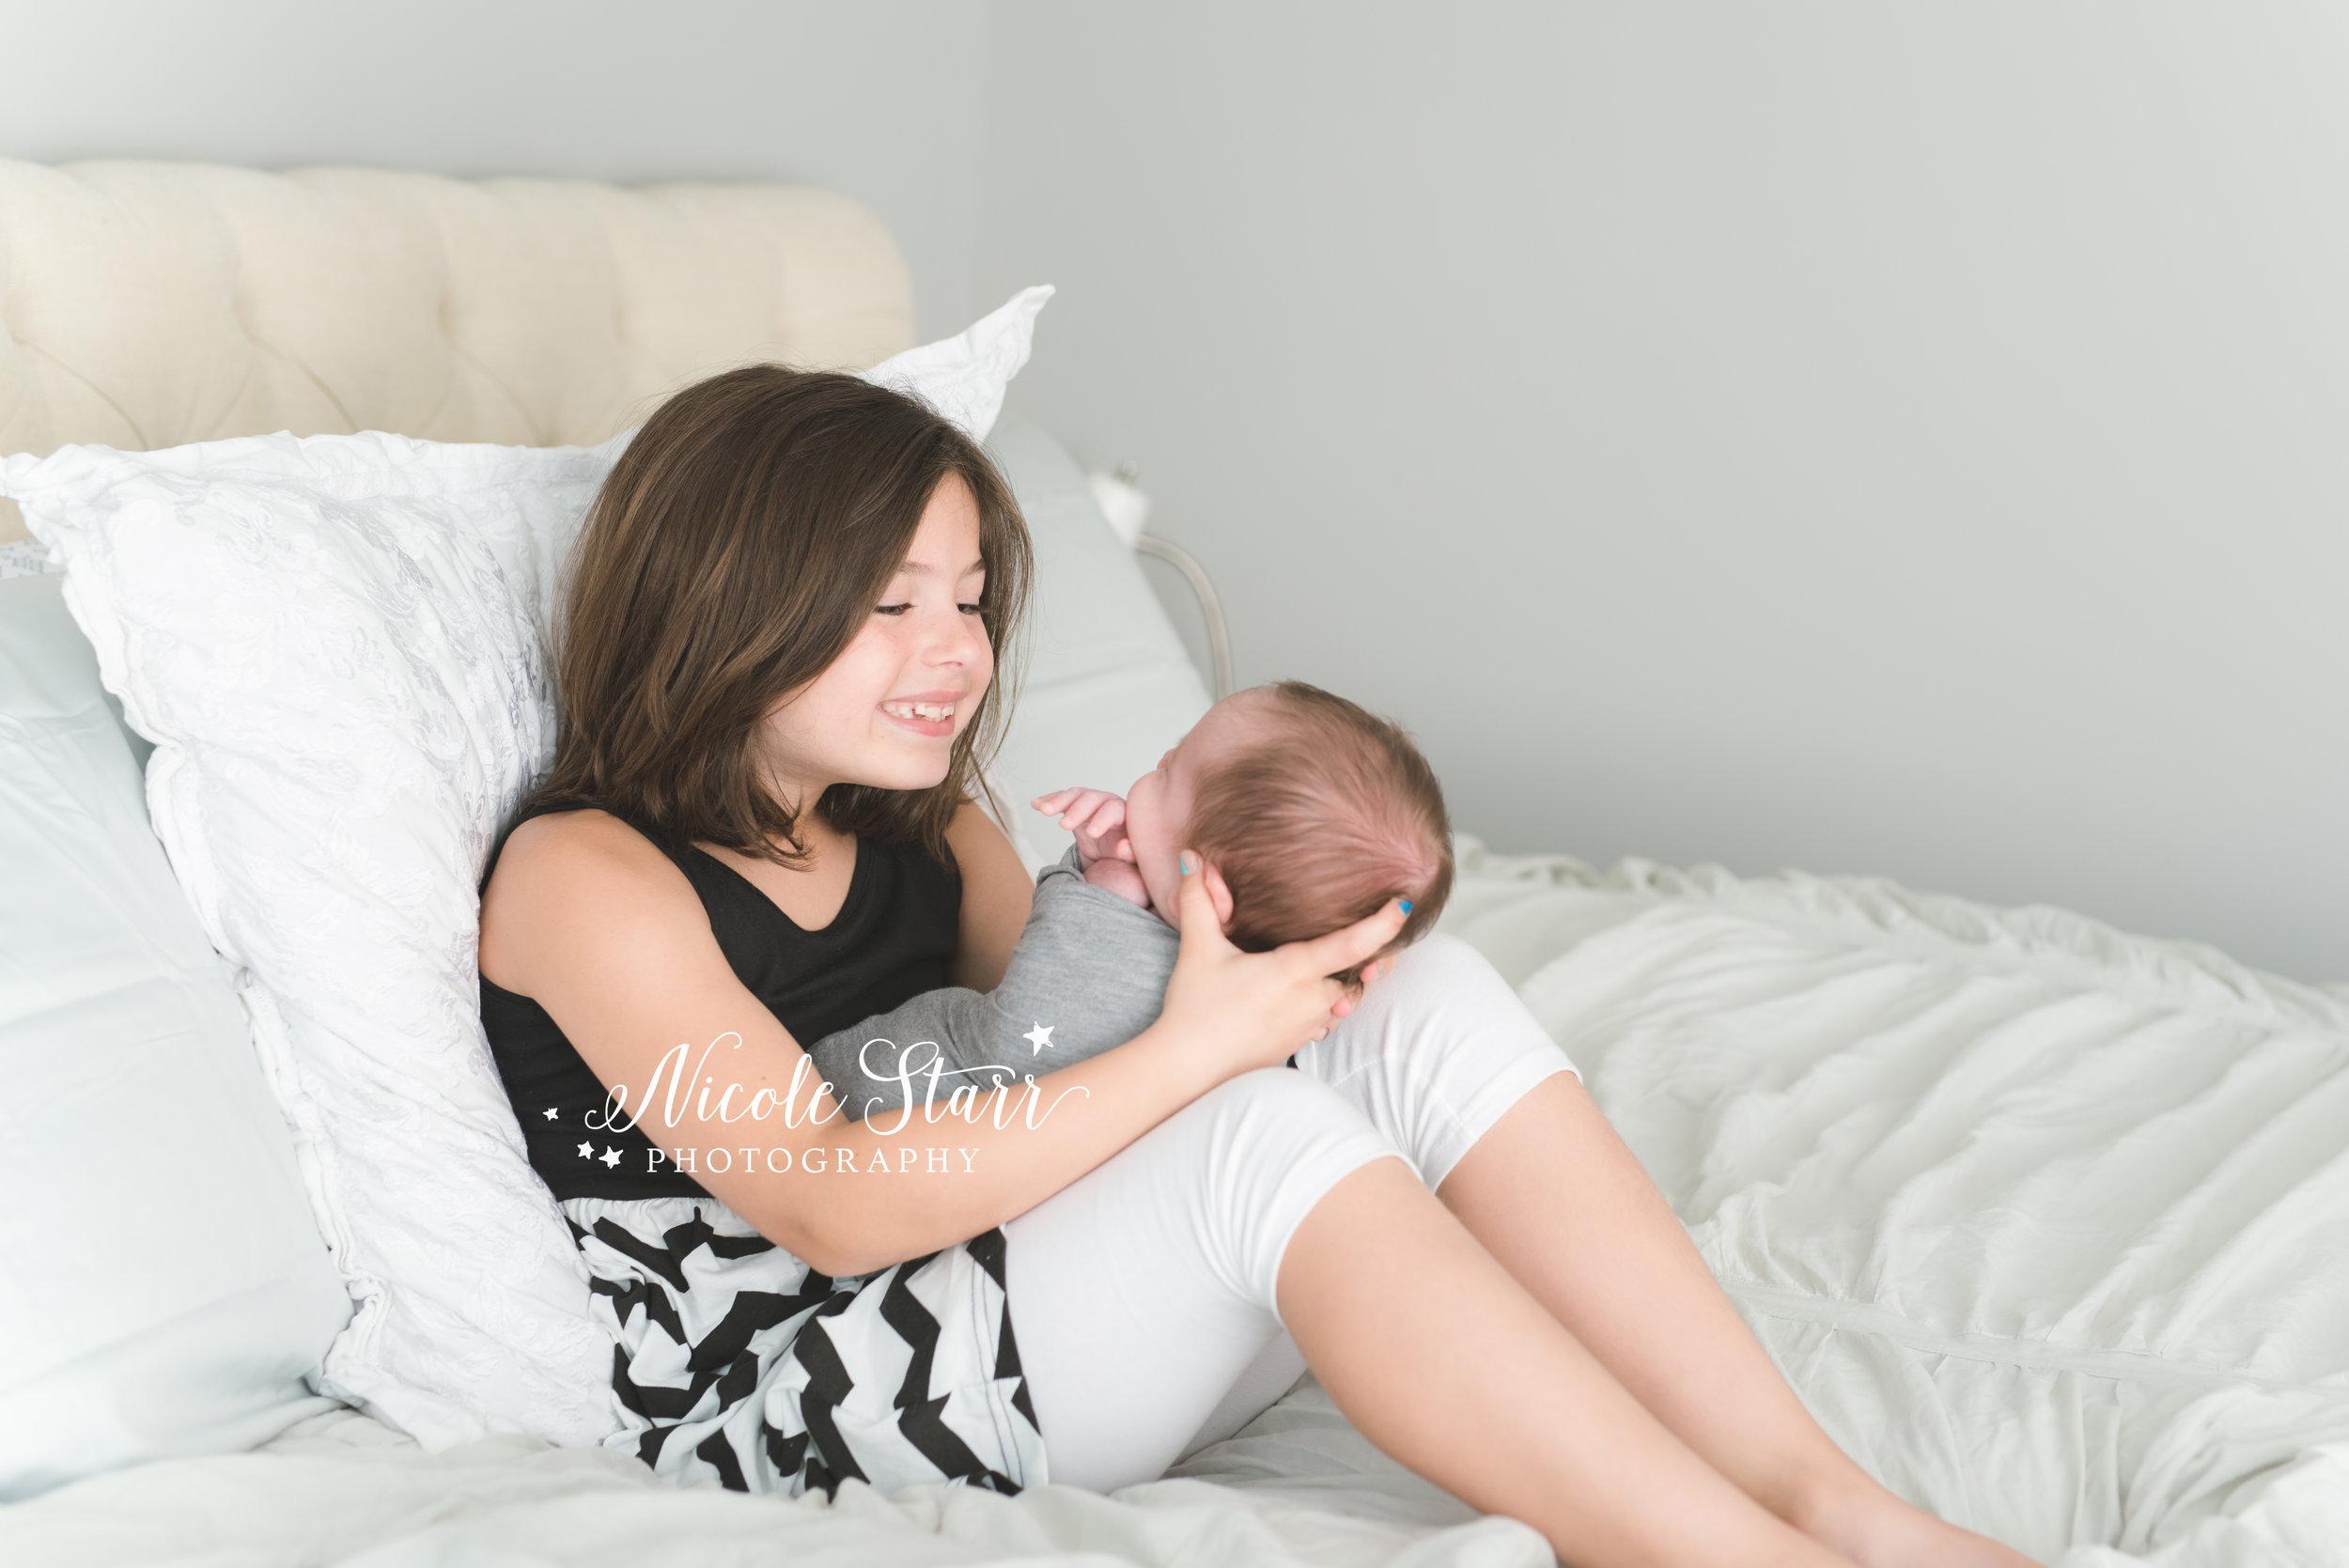 Nicole Starr Photography, Saratoga Springs lifestyle newborn photographer